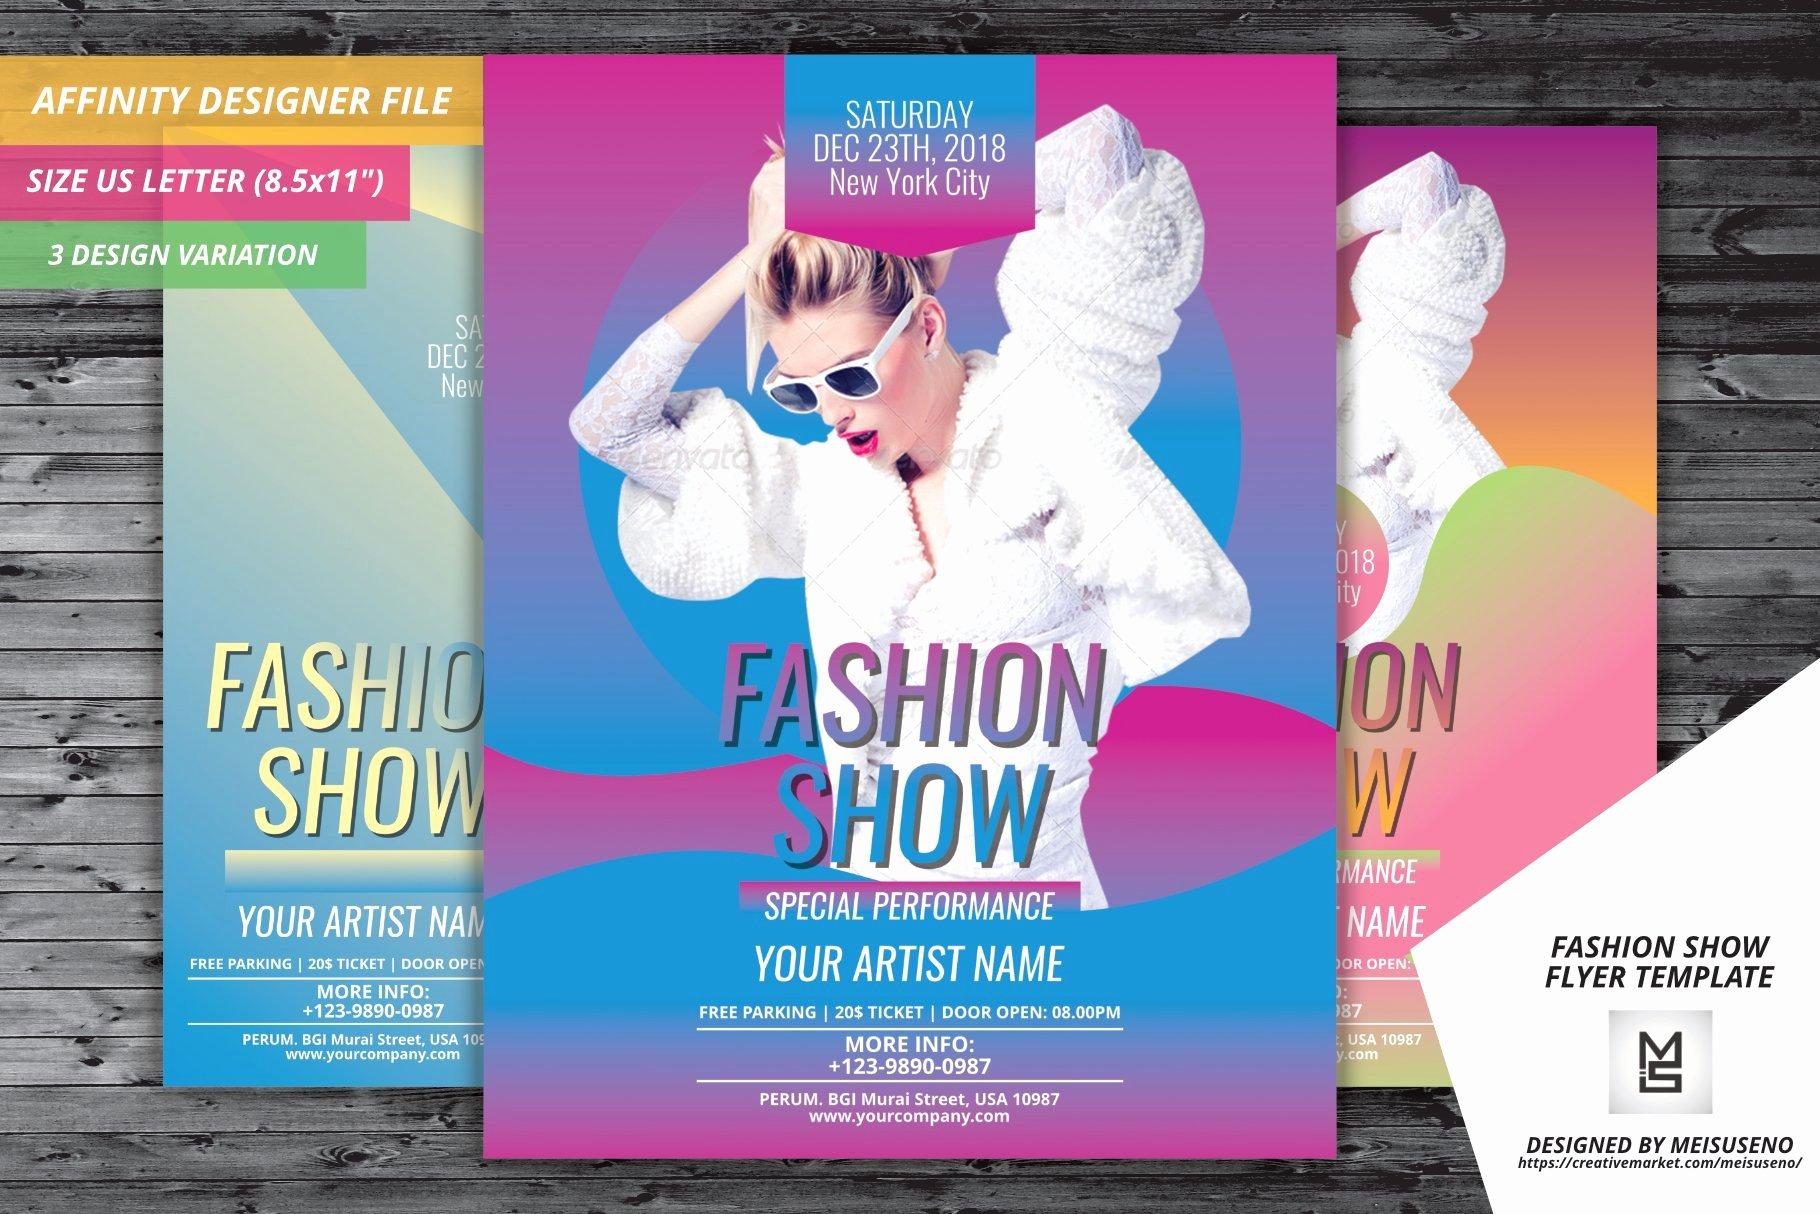 Fashion Show Flyer Template Free New Fashion Show Flyer Template Flyer Templates Creative